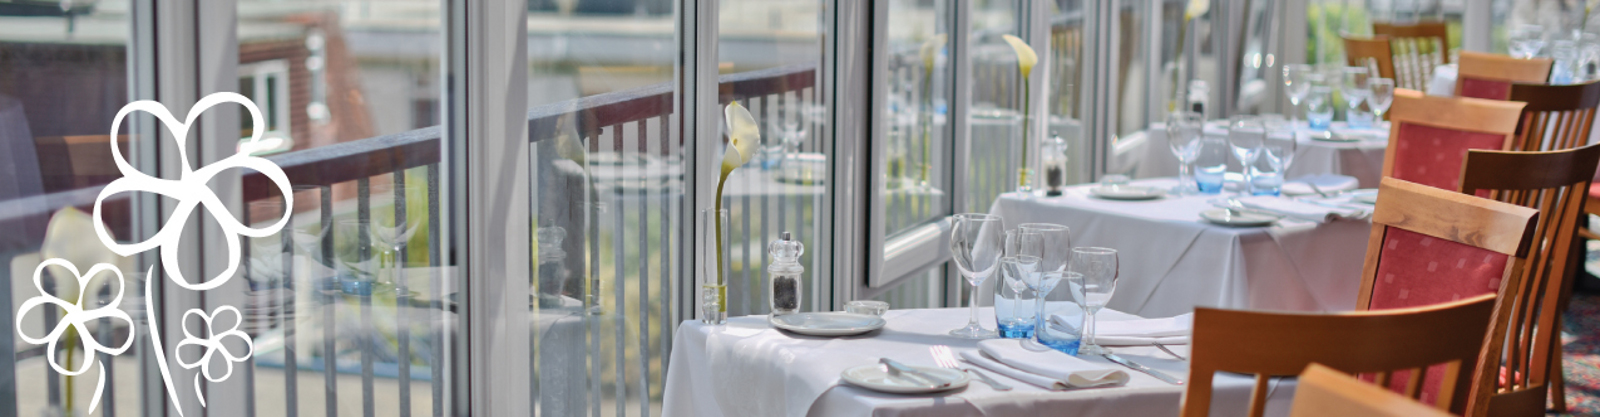 restaurant1b-sktch